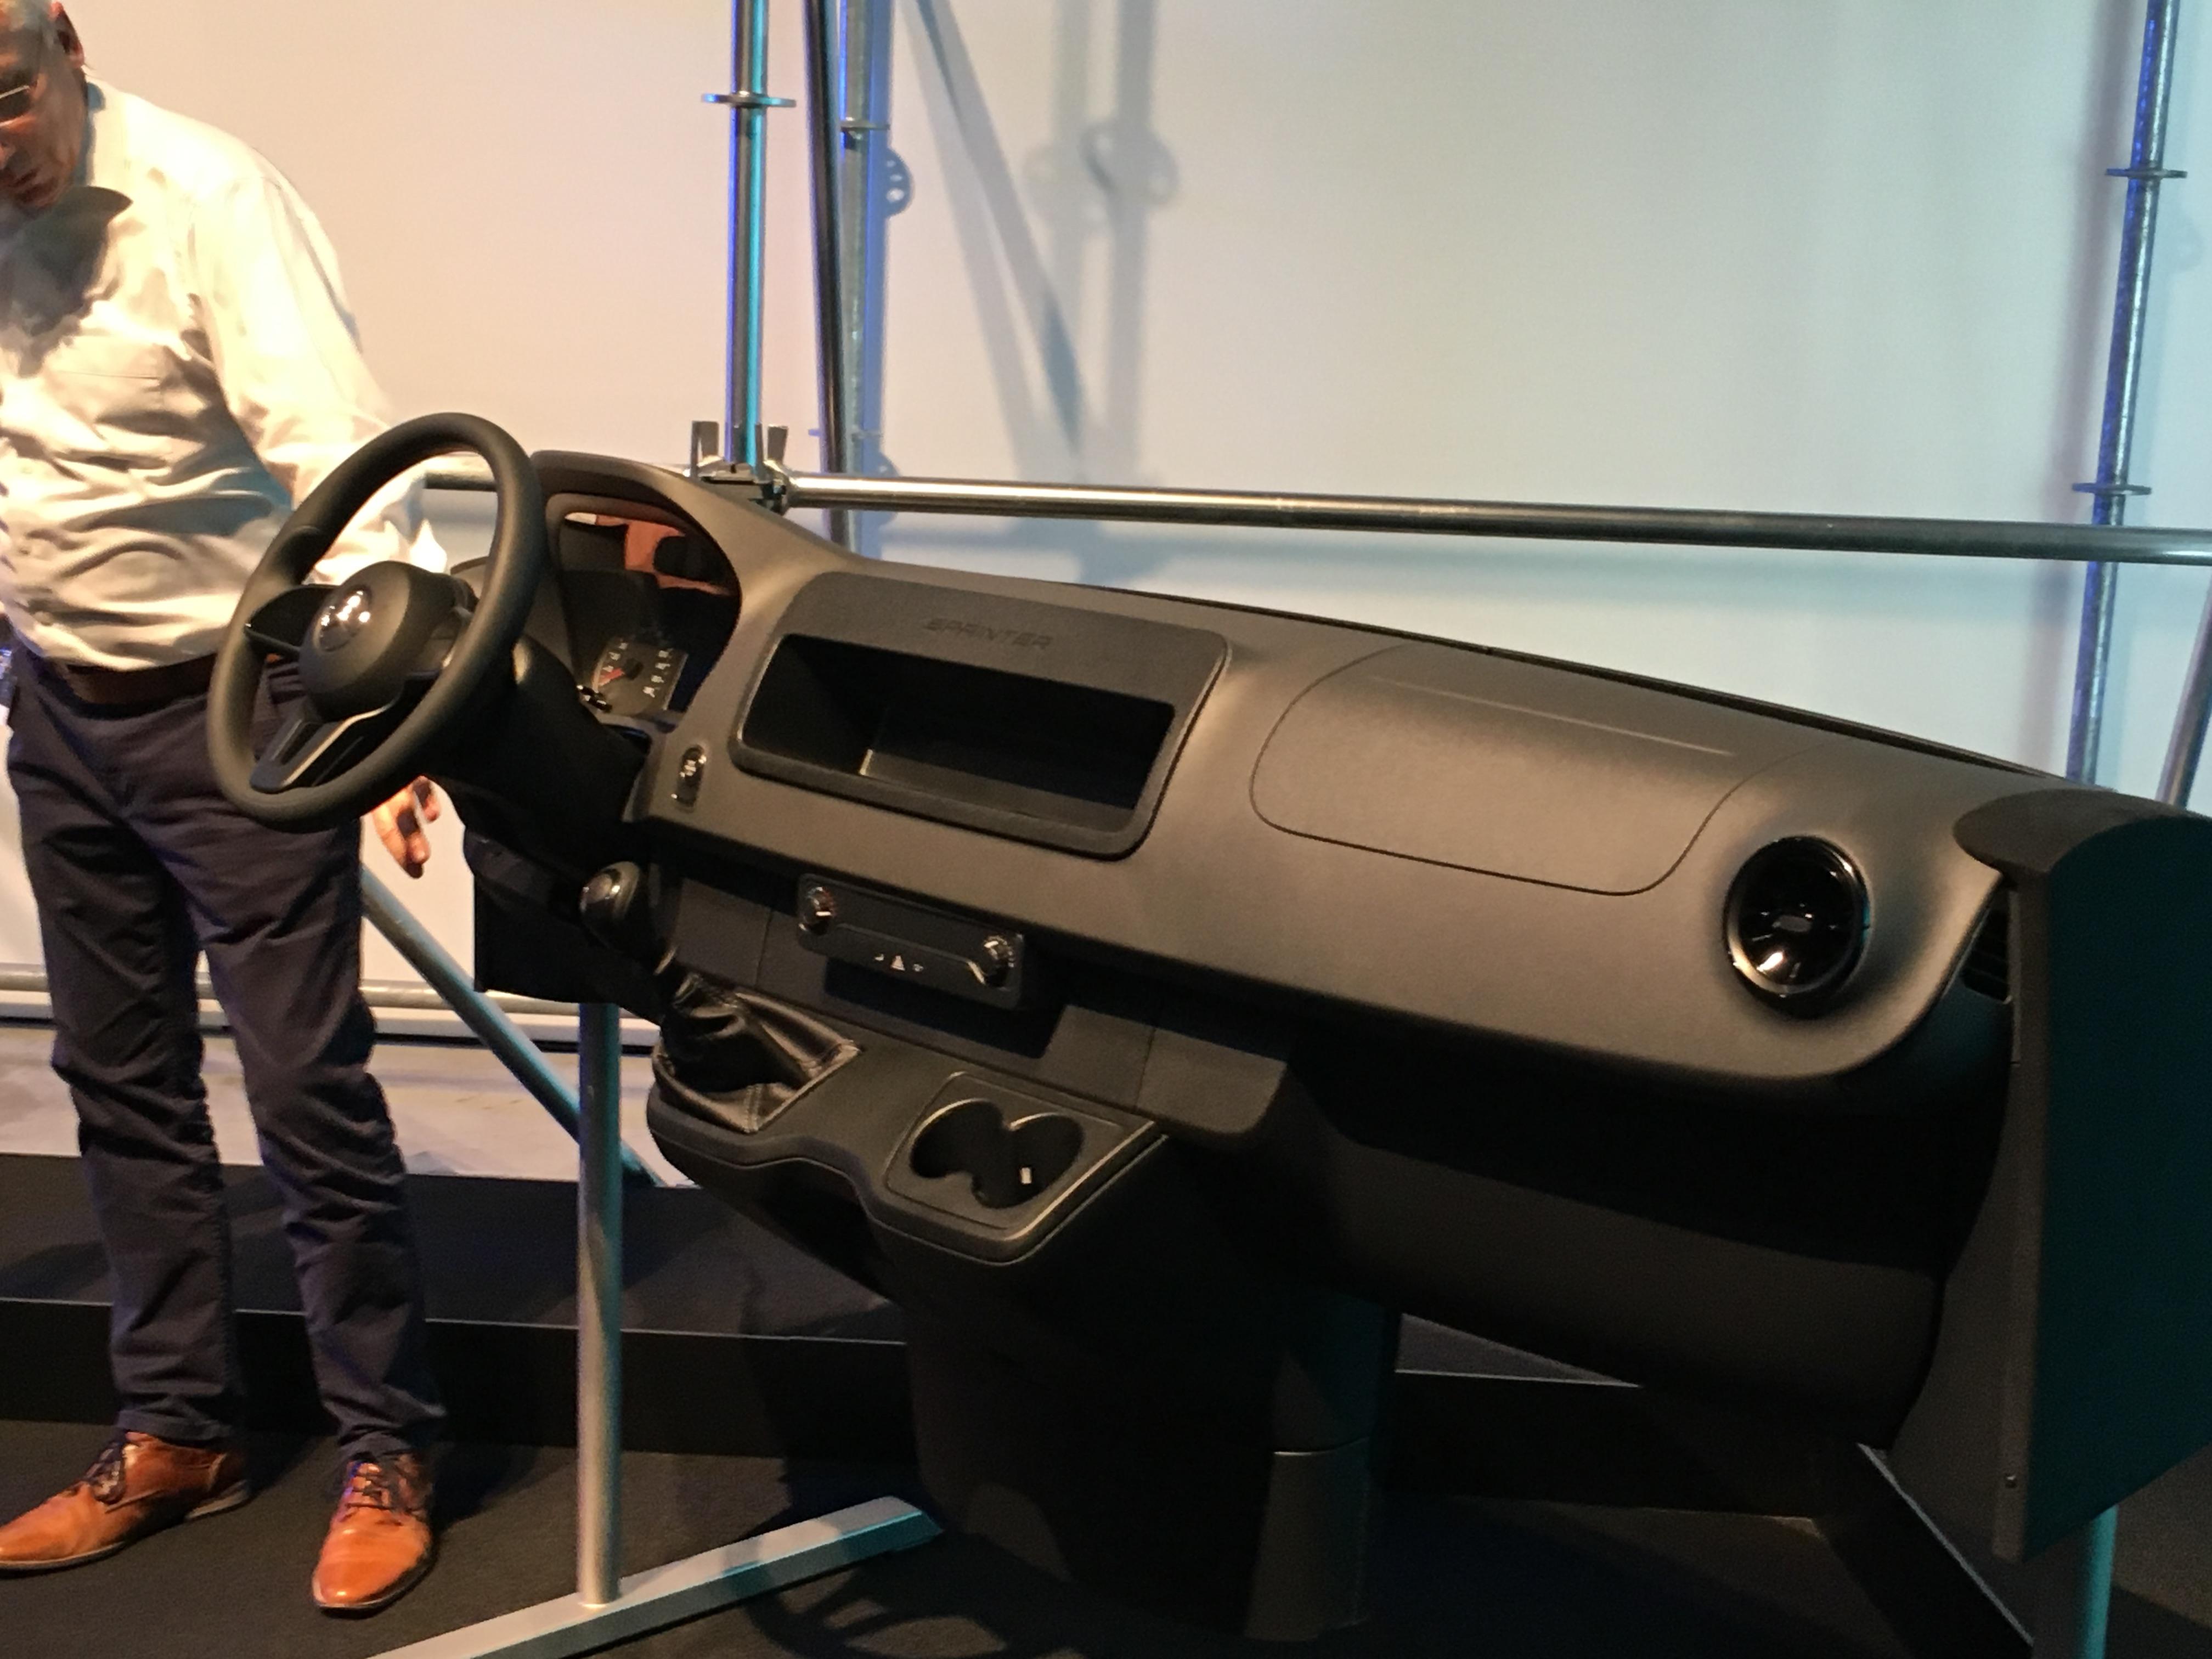 nouveau mercedes sprinter 2018 la r volution dans l. Black Bedroom Furniture Sets. Home Design Ideas